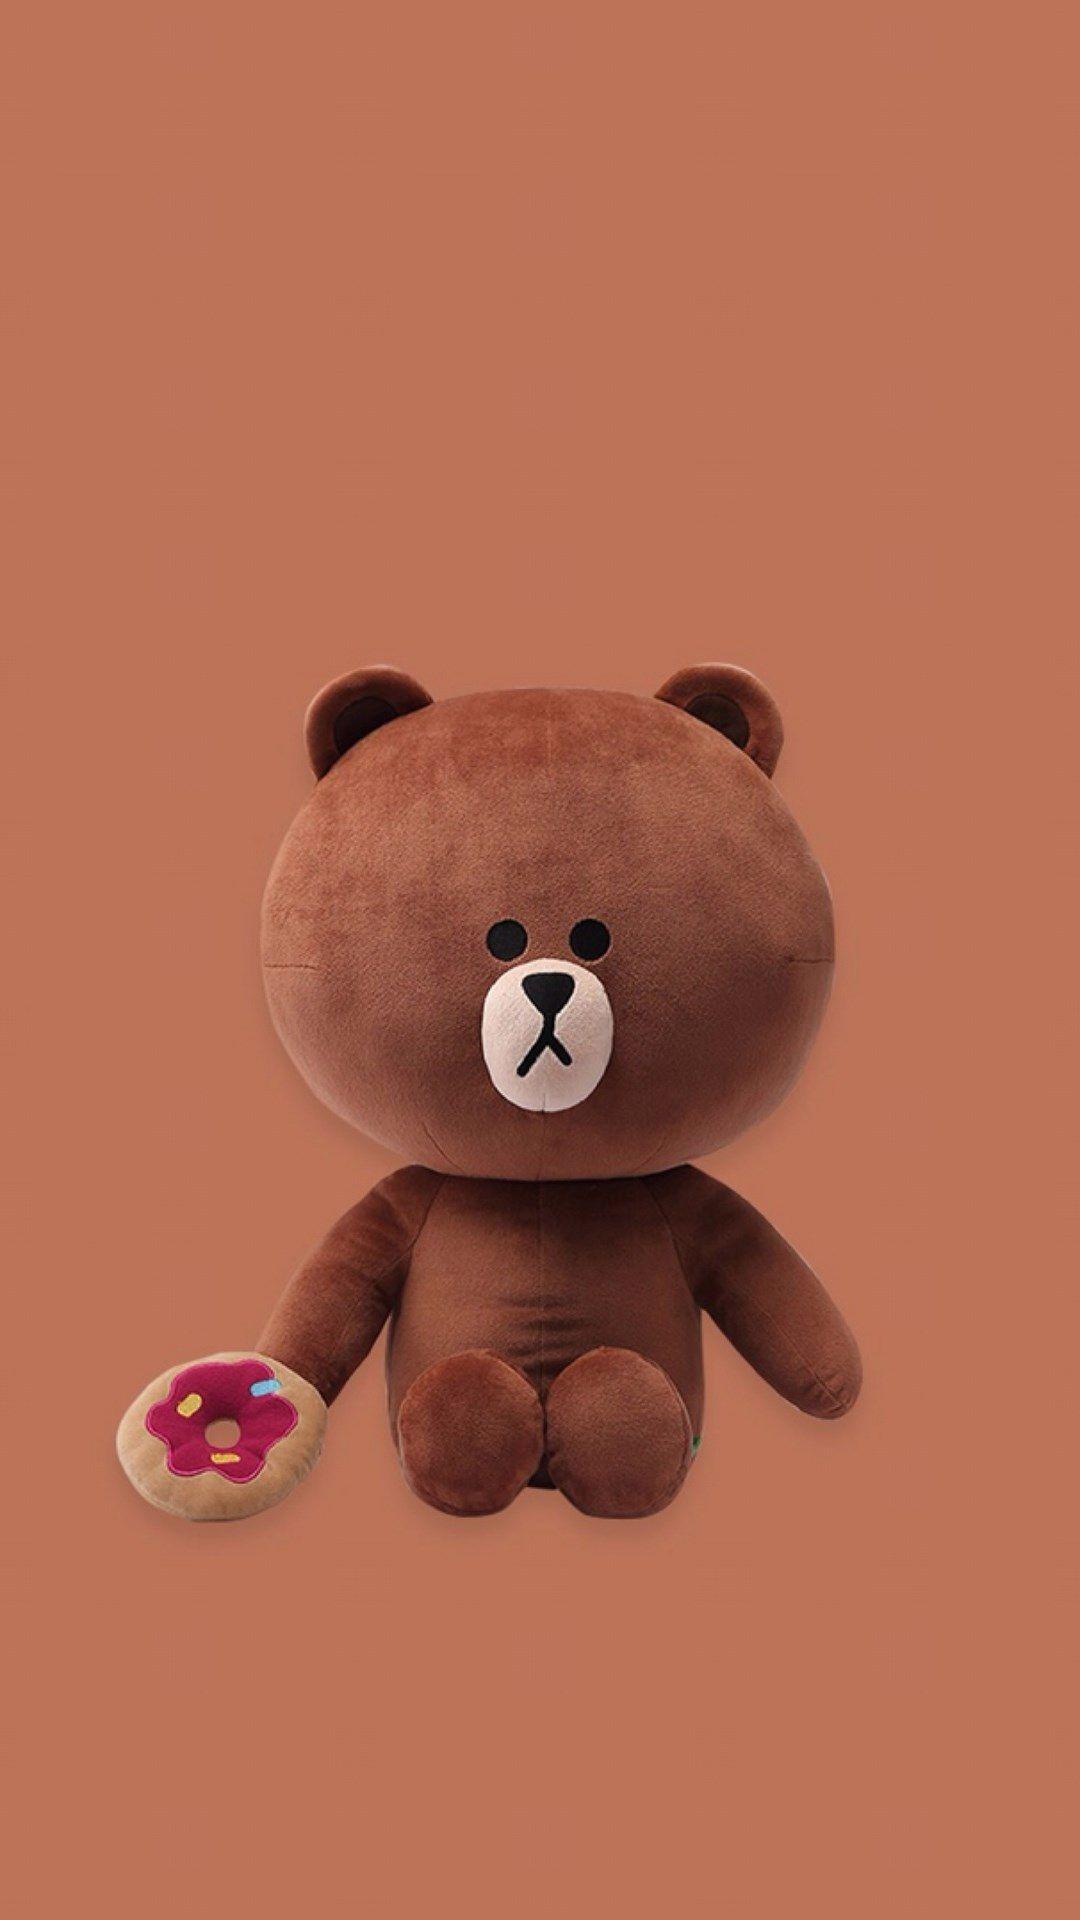 Animal iphone wallpaper tumblr - Rag Roll Cute Cartoon Bear Iphone Wallpaper Ilikewallpaper Com Cute